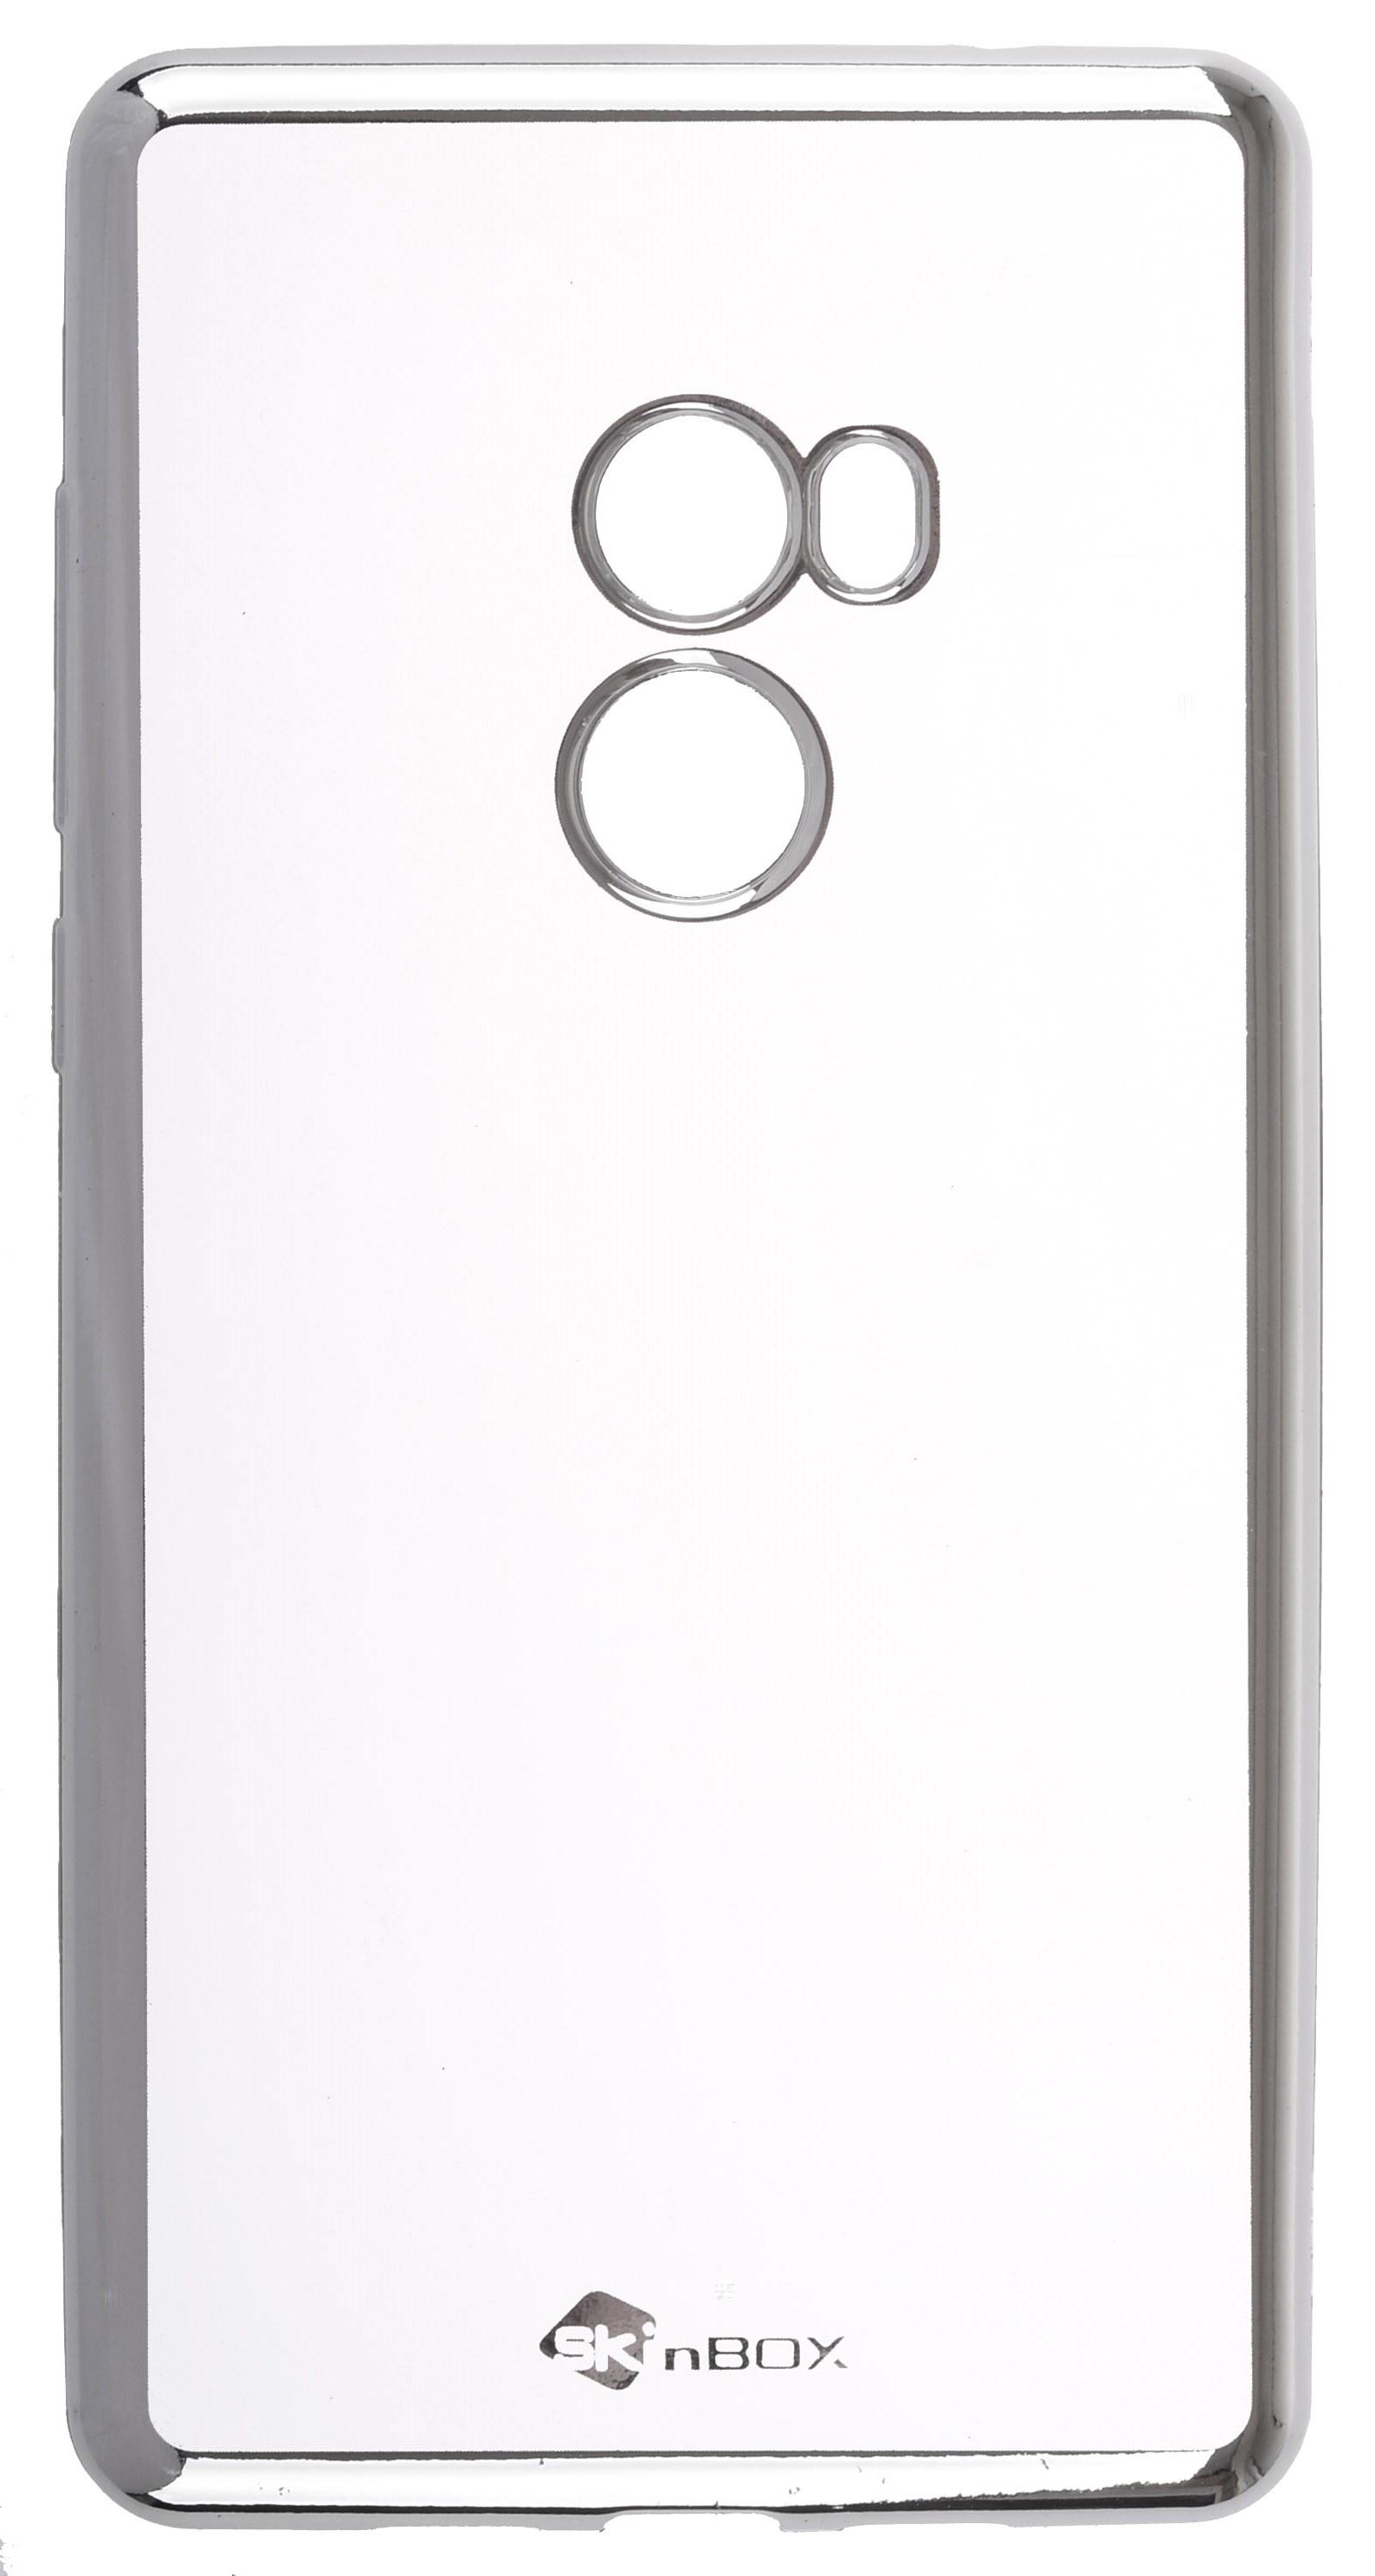 Чехол для сотового телефона skinBOX Silicone chrome border, 4630042524408, серебристый чехол для сотового телефона skinbox silicone chrome border 4630042528697 серебристый